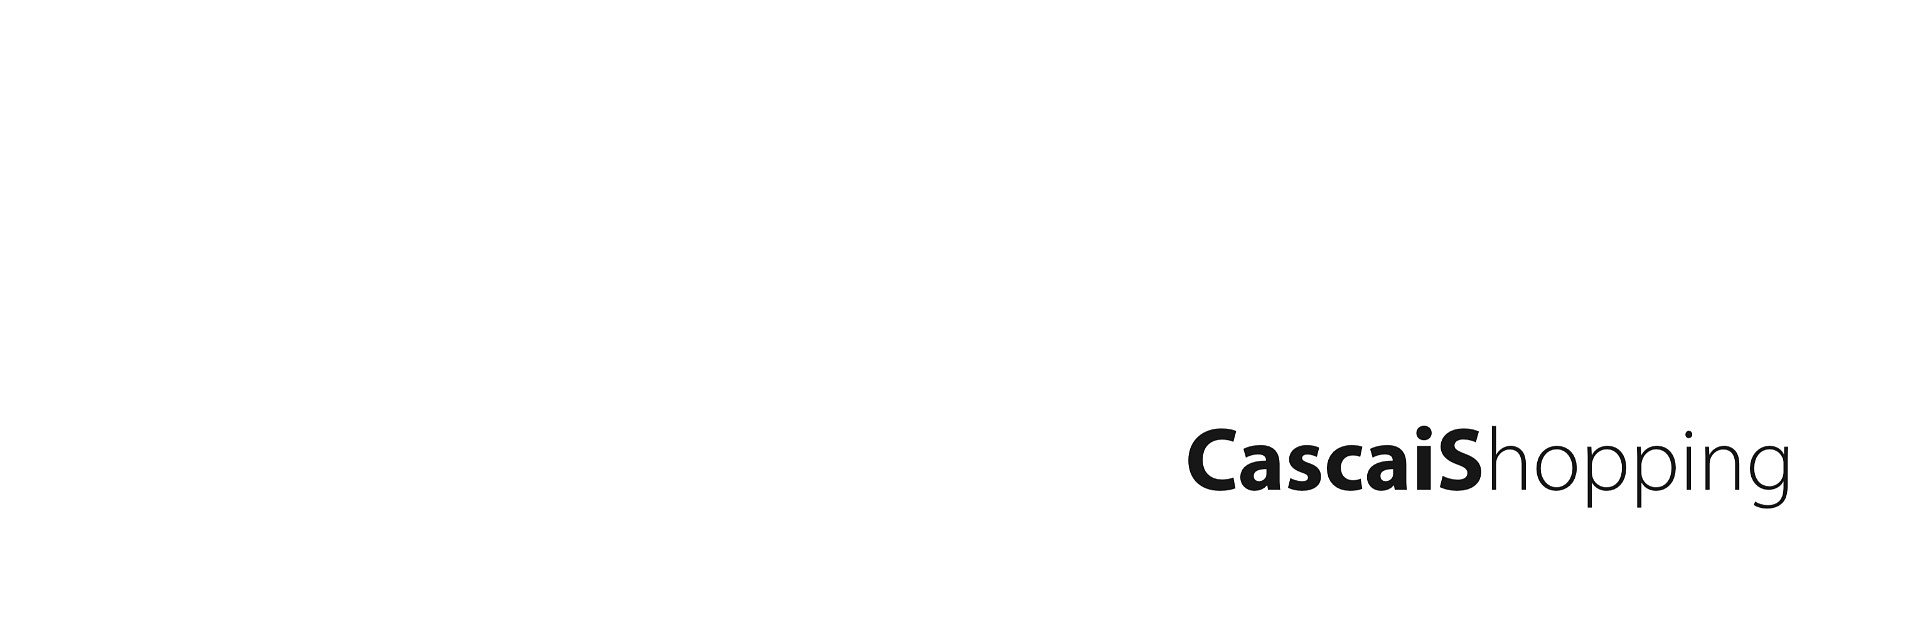 CascaiShopping promove trabalhos de alunos da escola da Cidadela